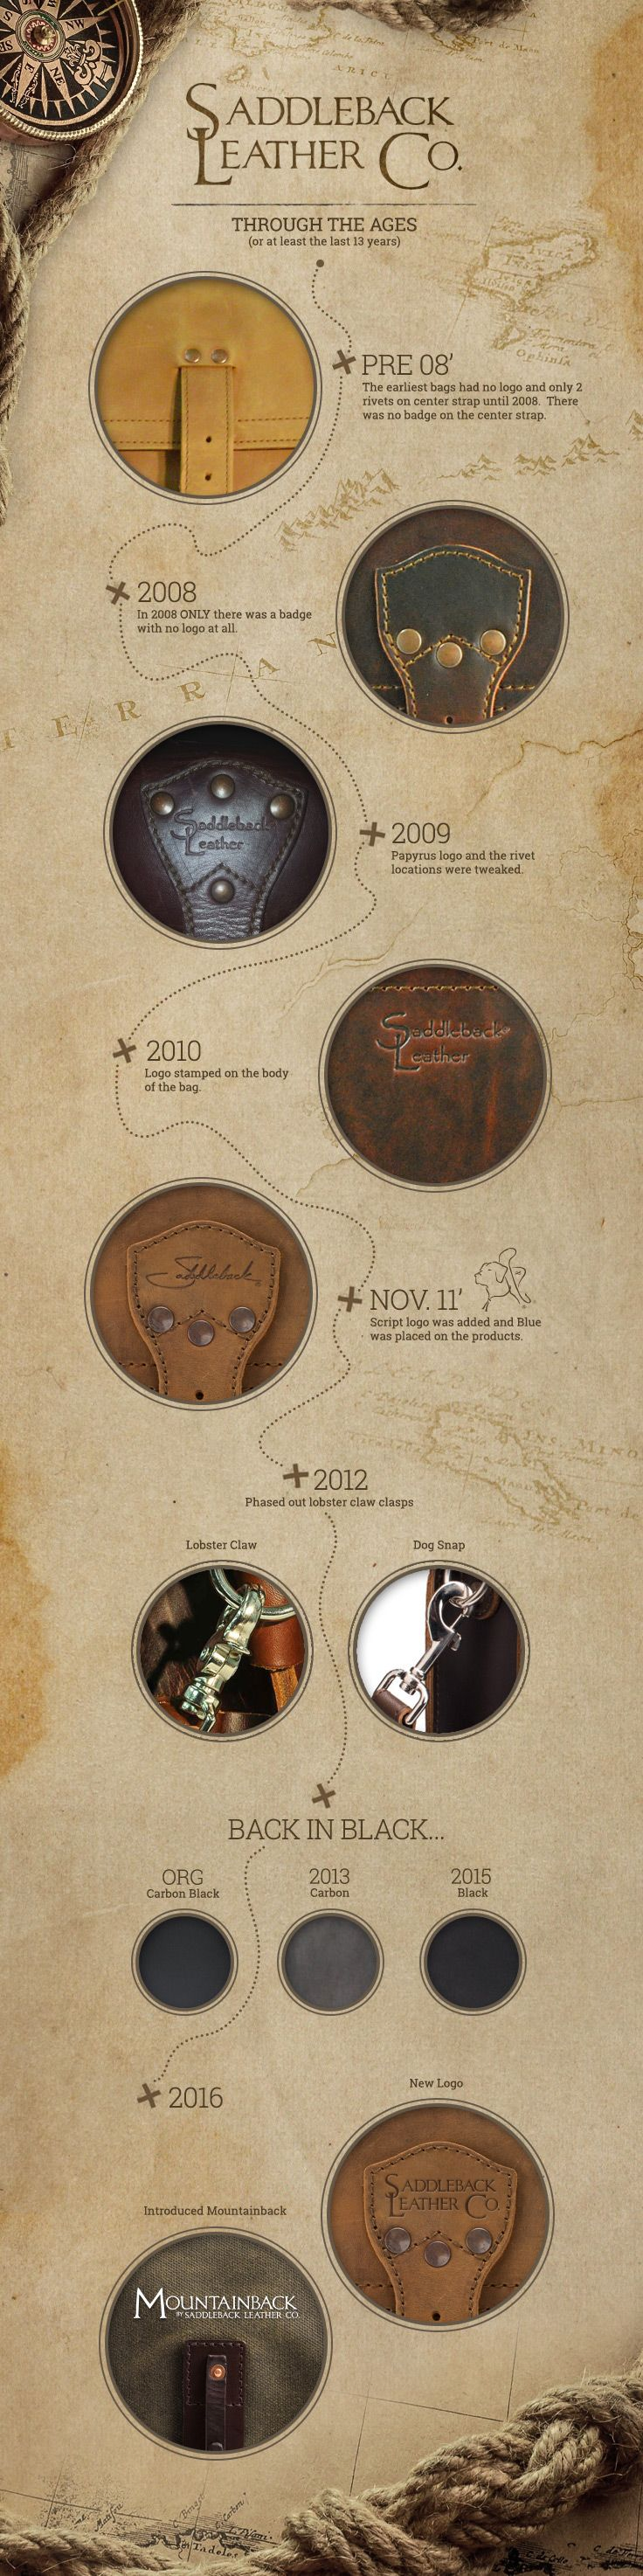 Saddleback Leather Co., a brief history